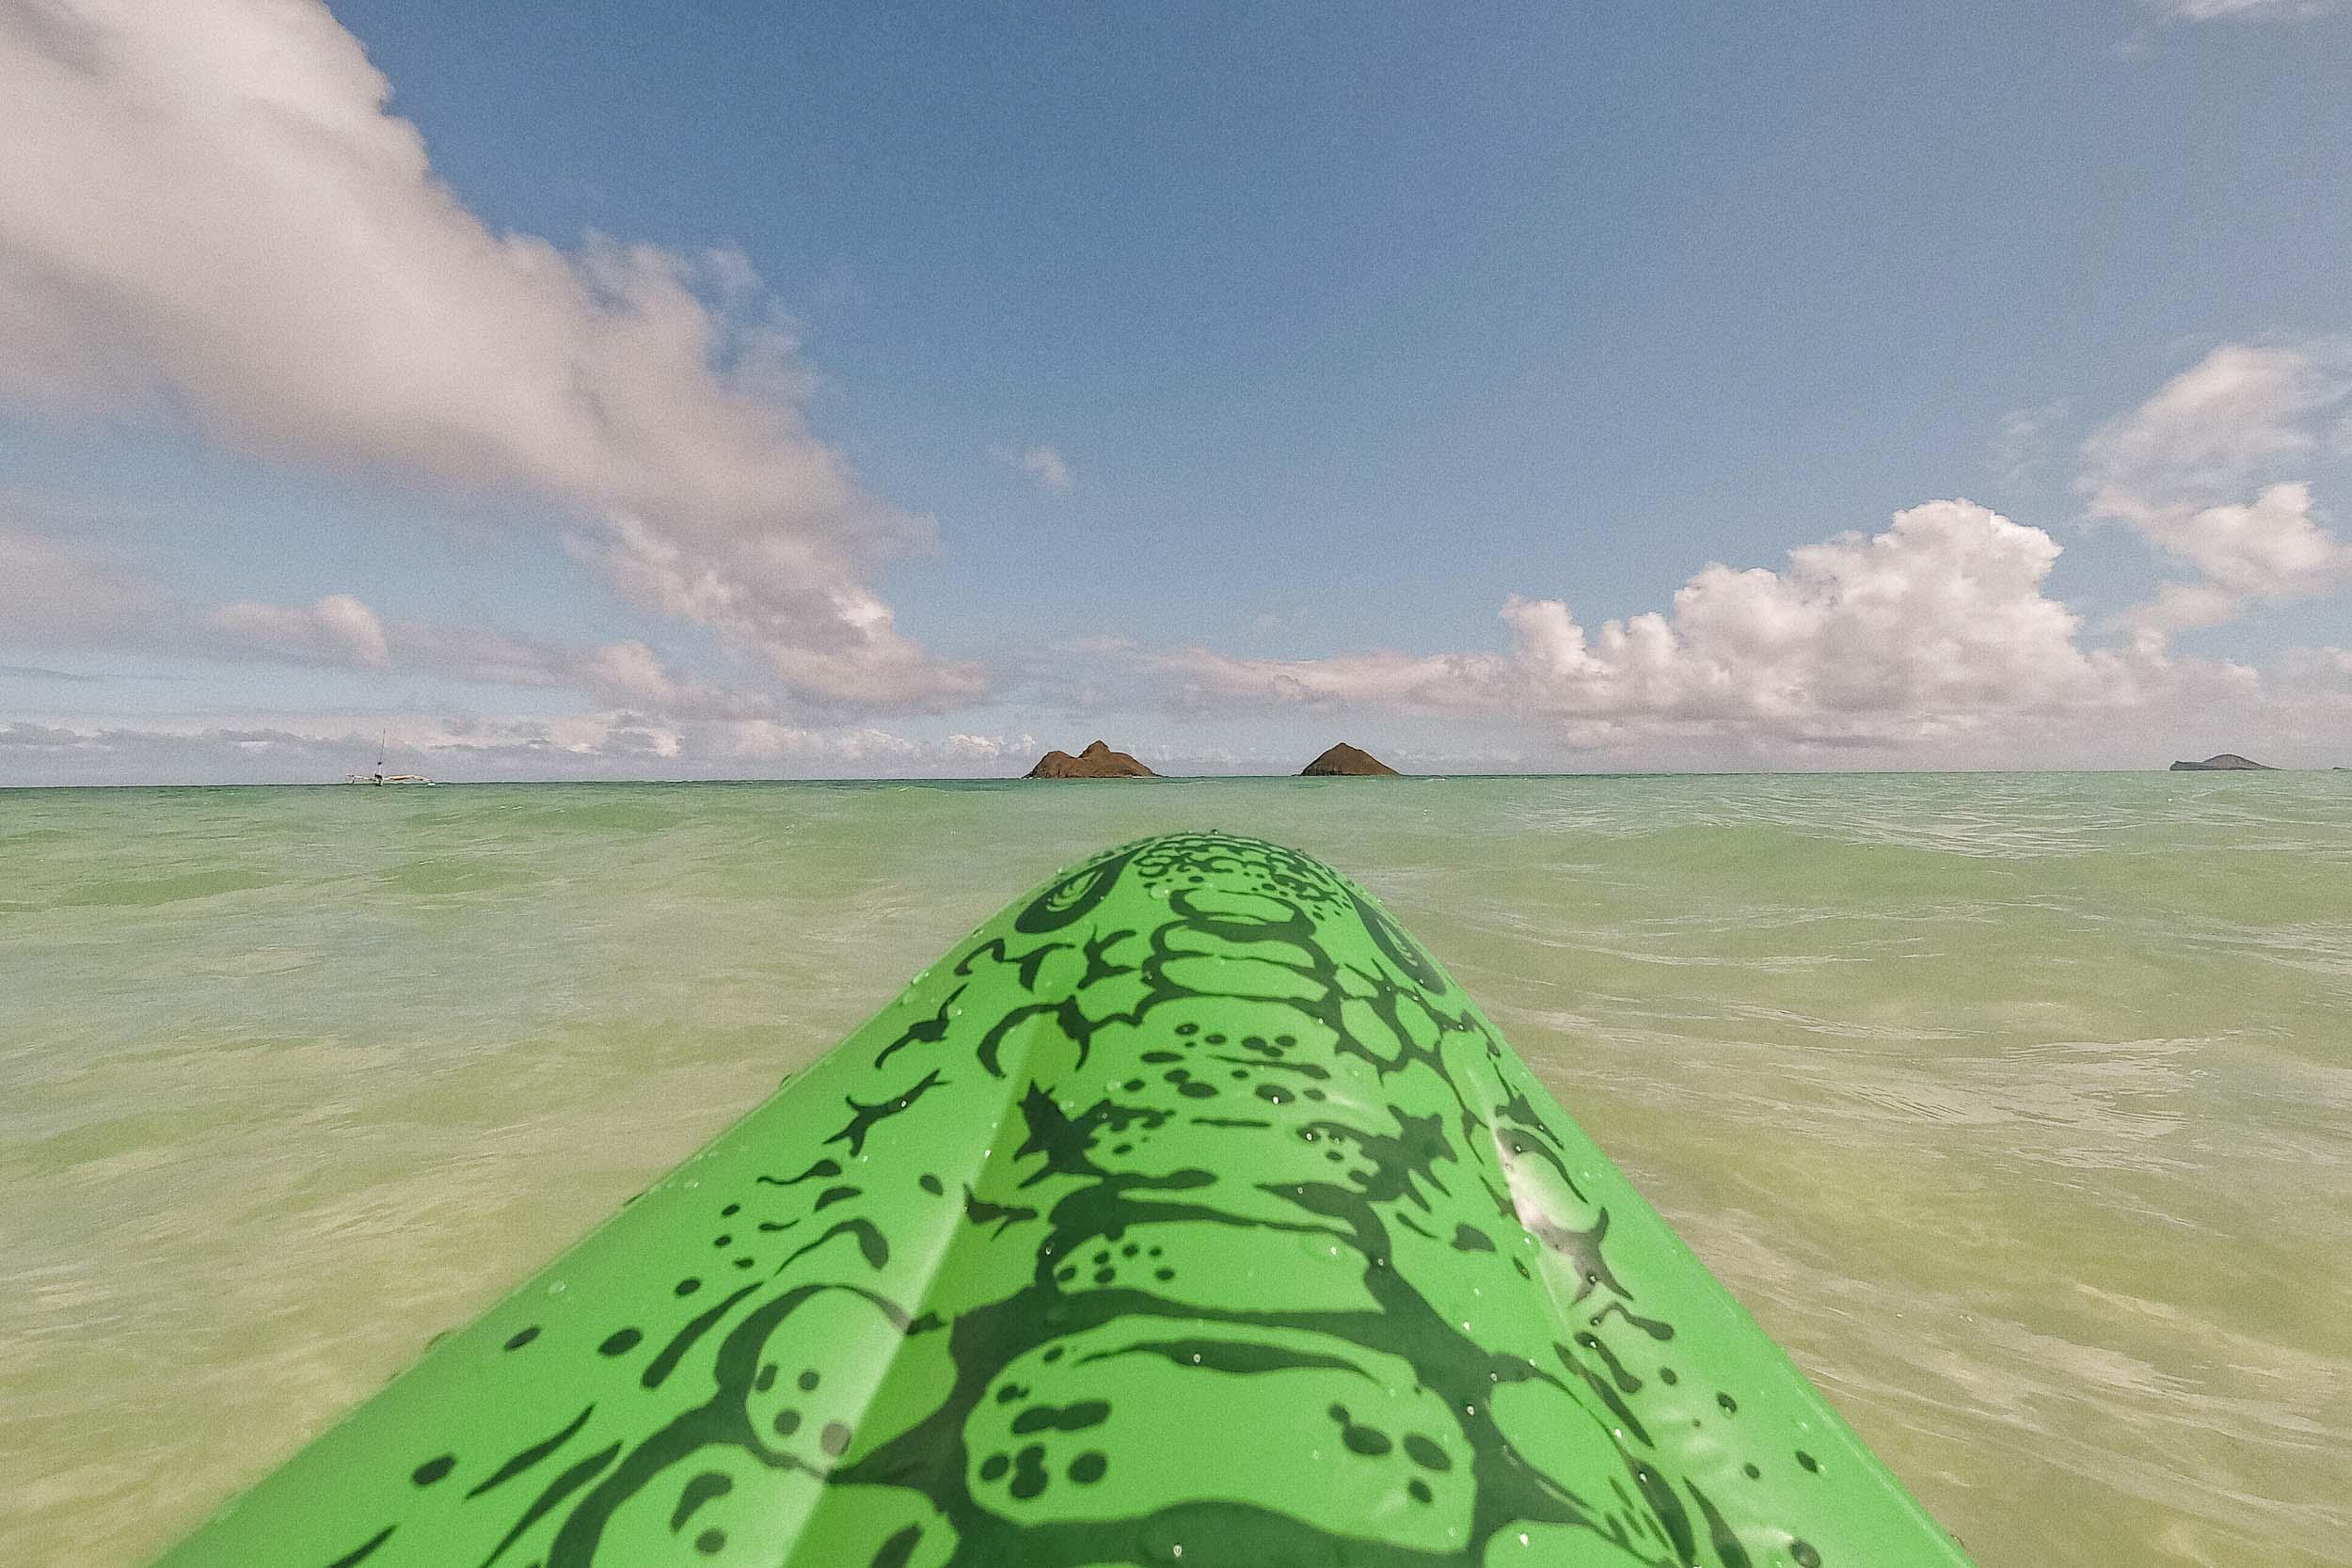 Floatie time at Lanikai